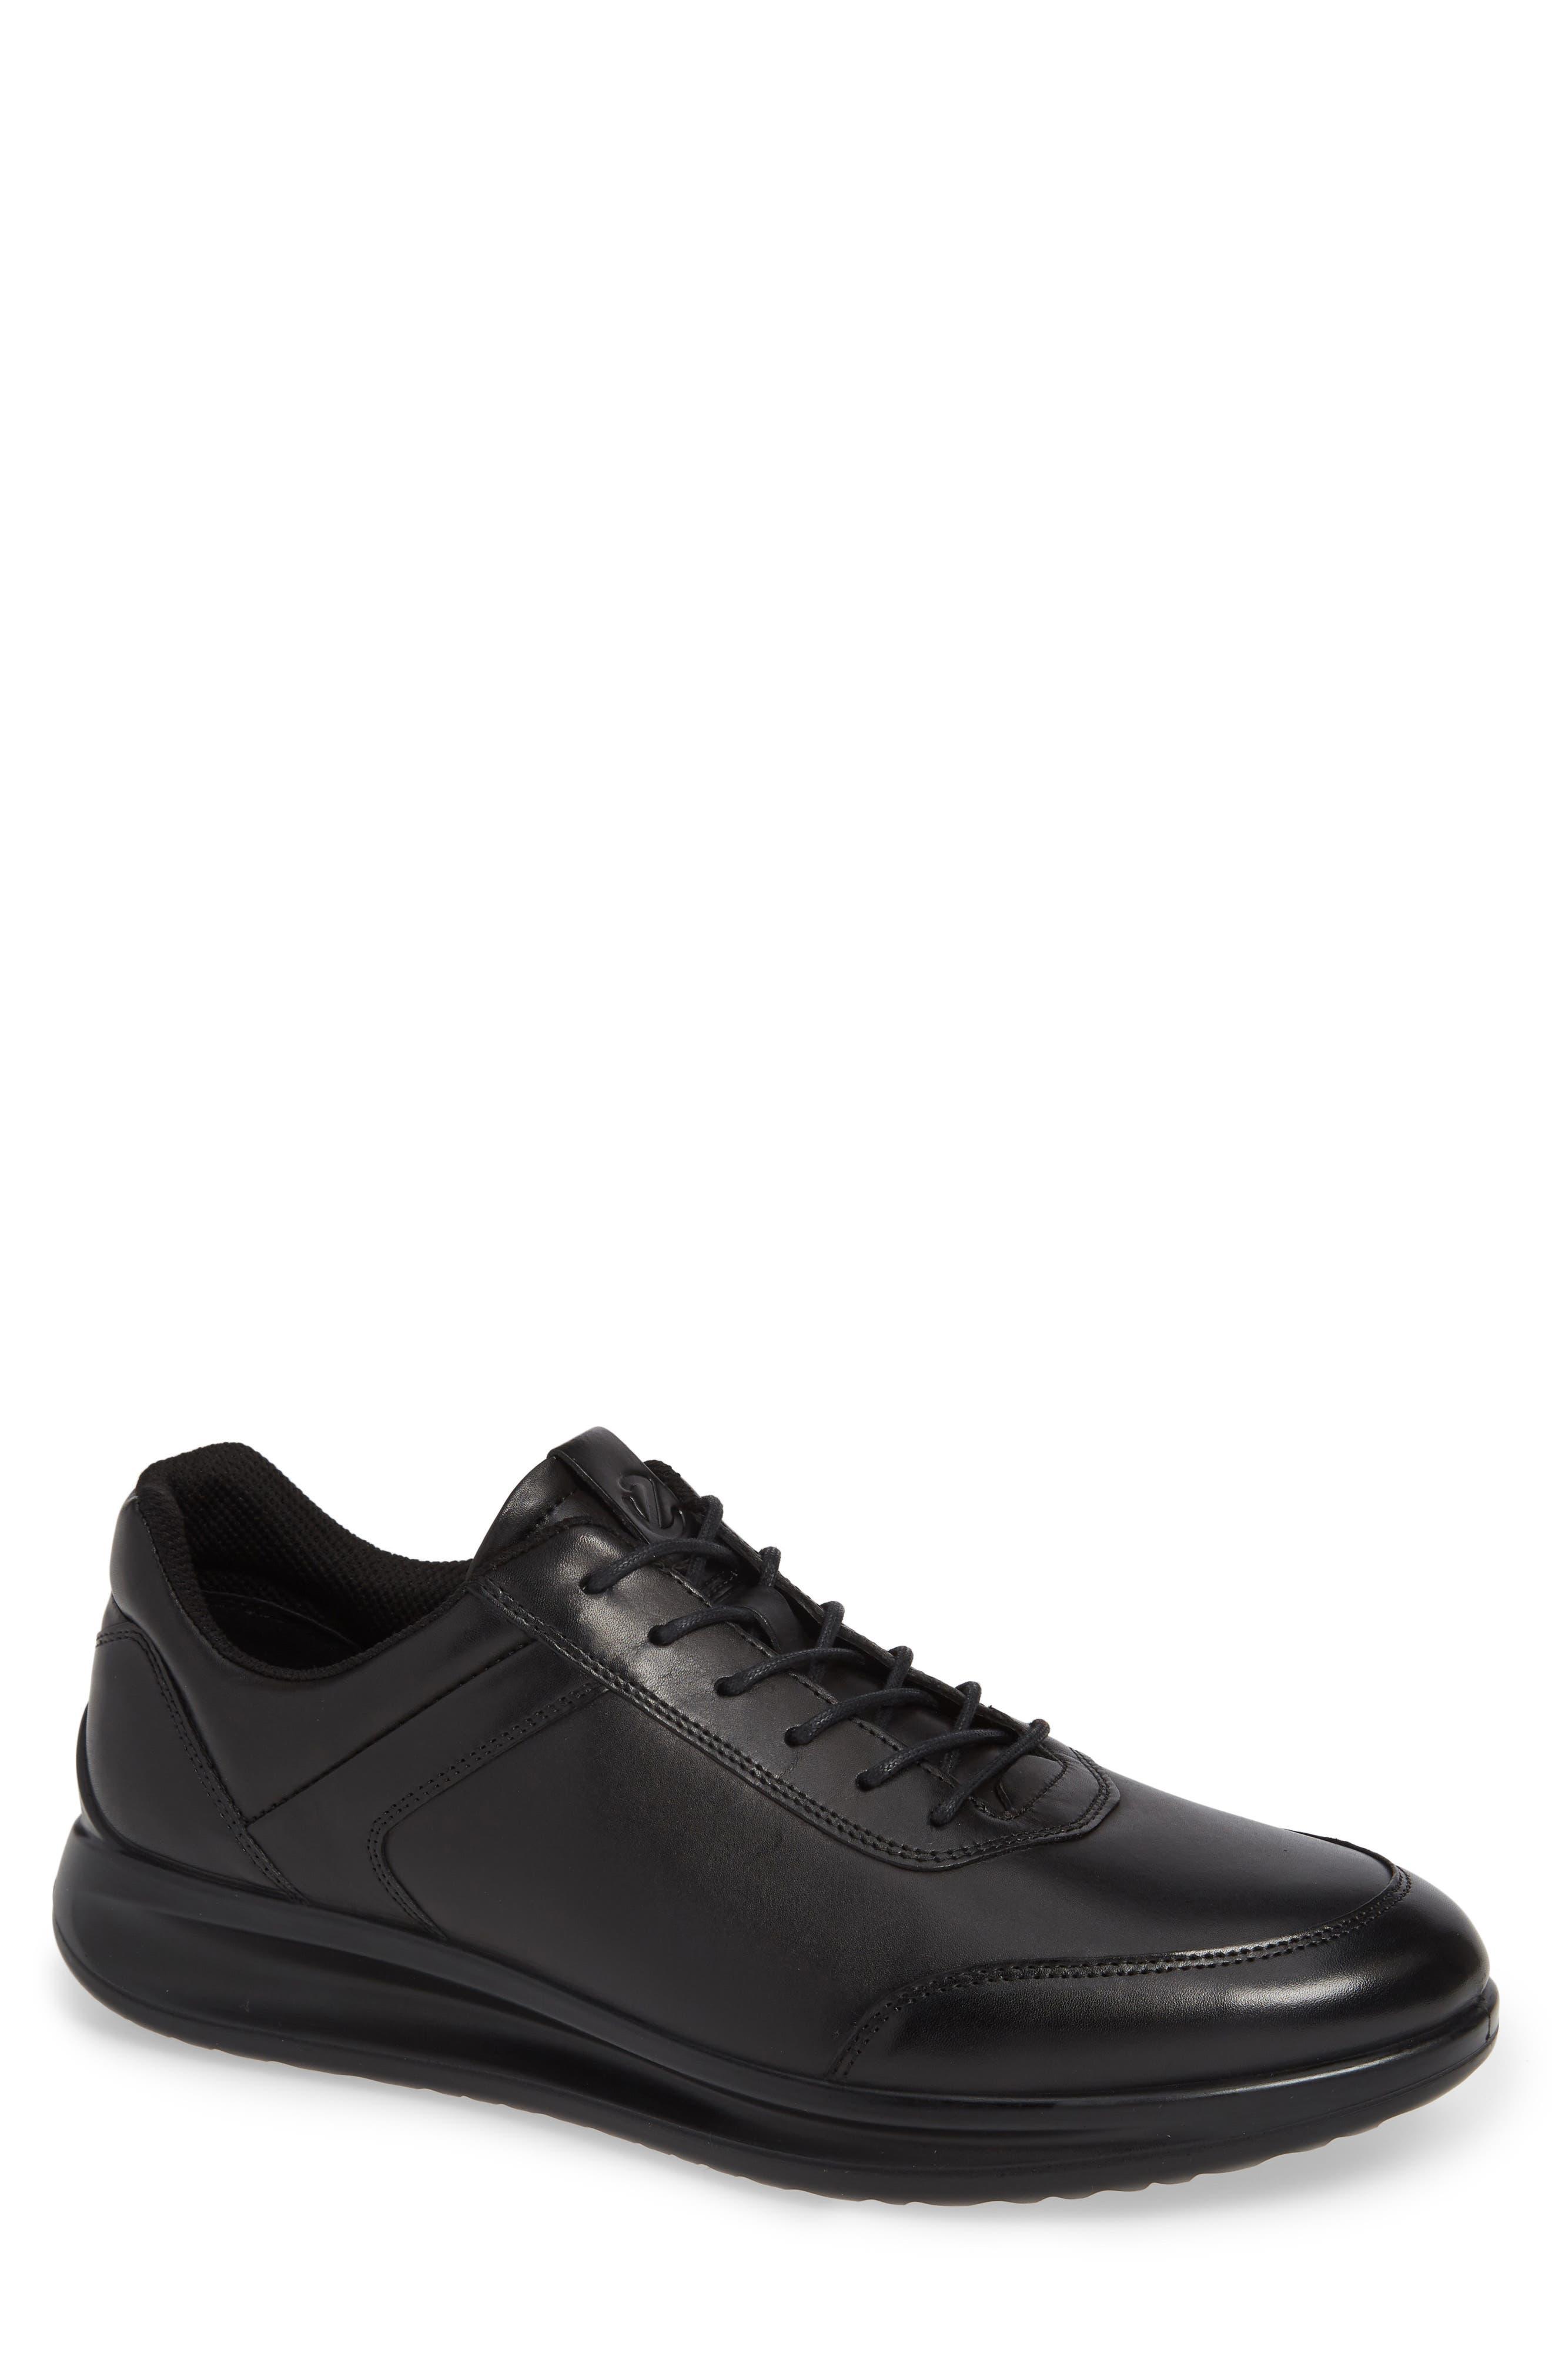 Aquet Low Top Sneaker, Main, color, BLACK LEATHER